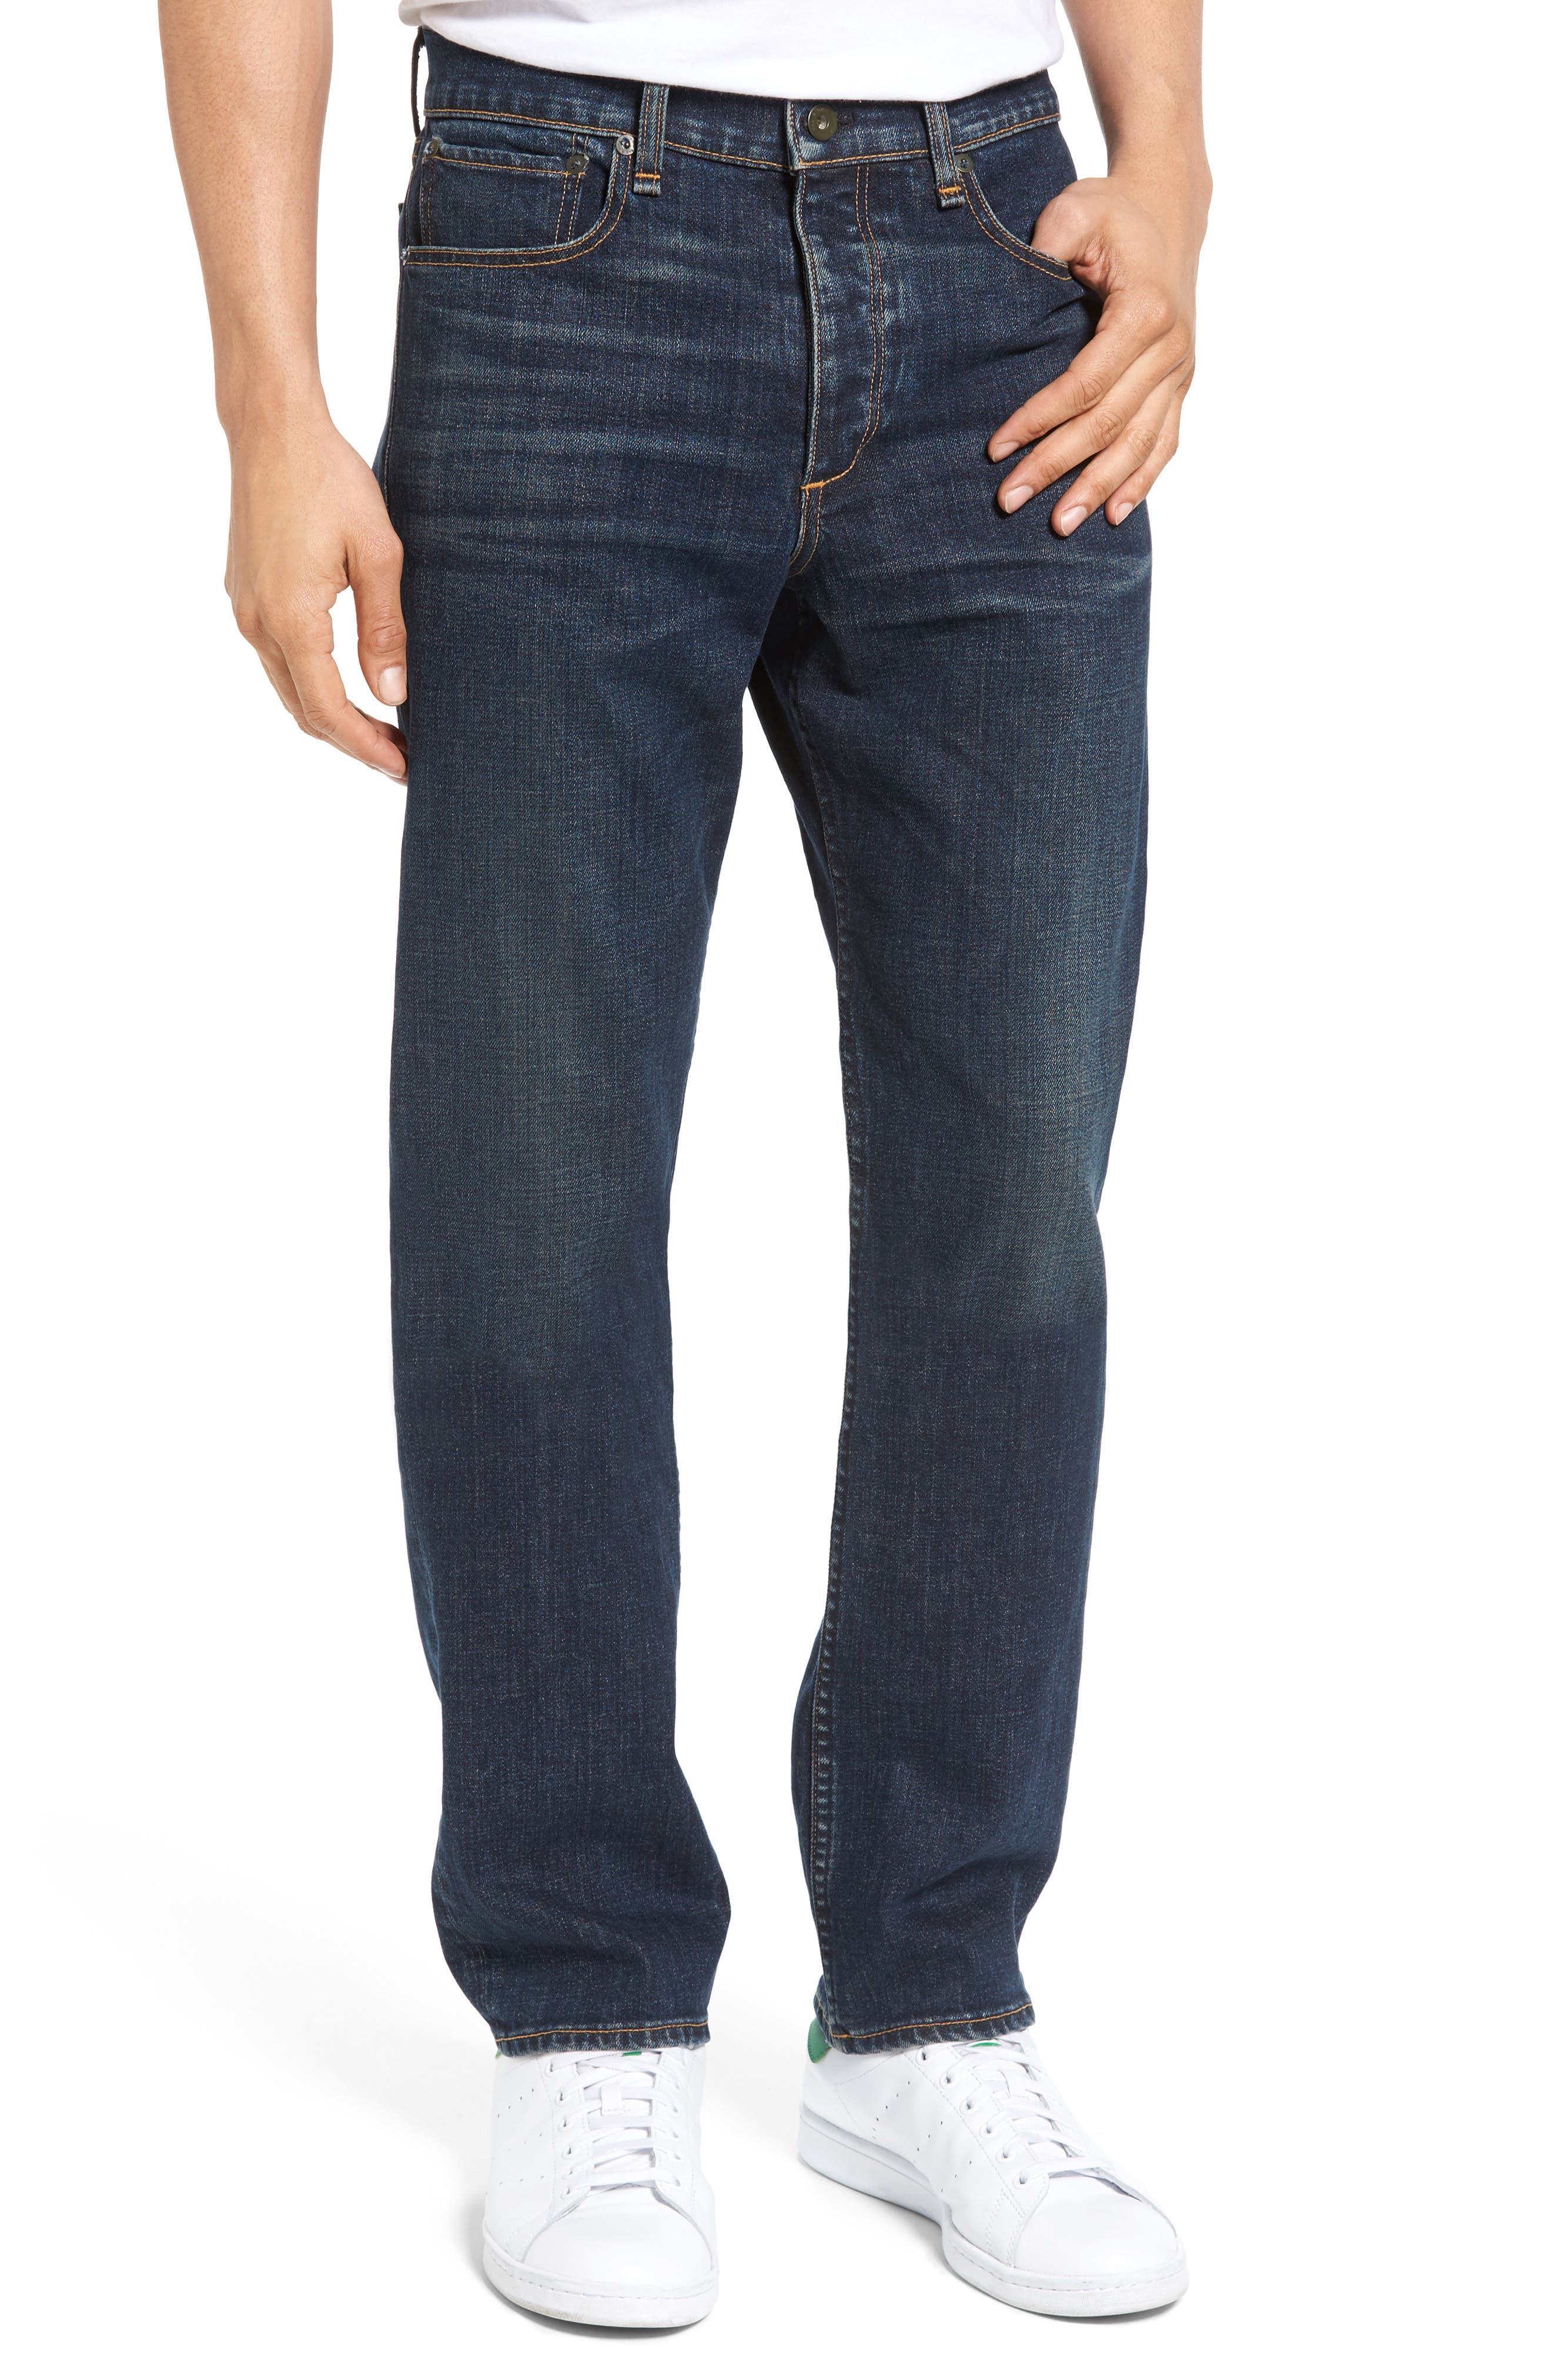 Fit 3 Slim Straight Leg Jeans,                         Main,                         color, 404